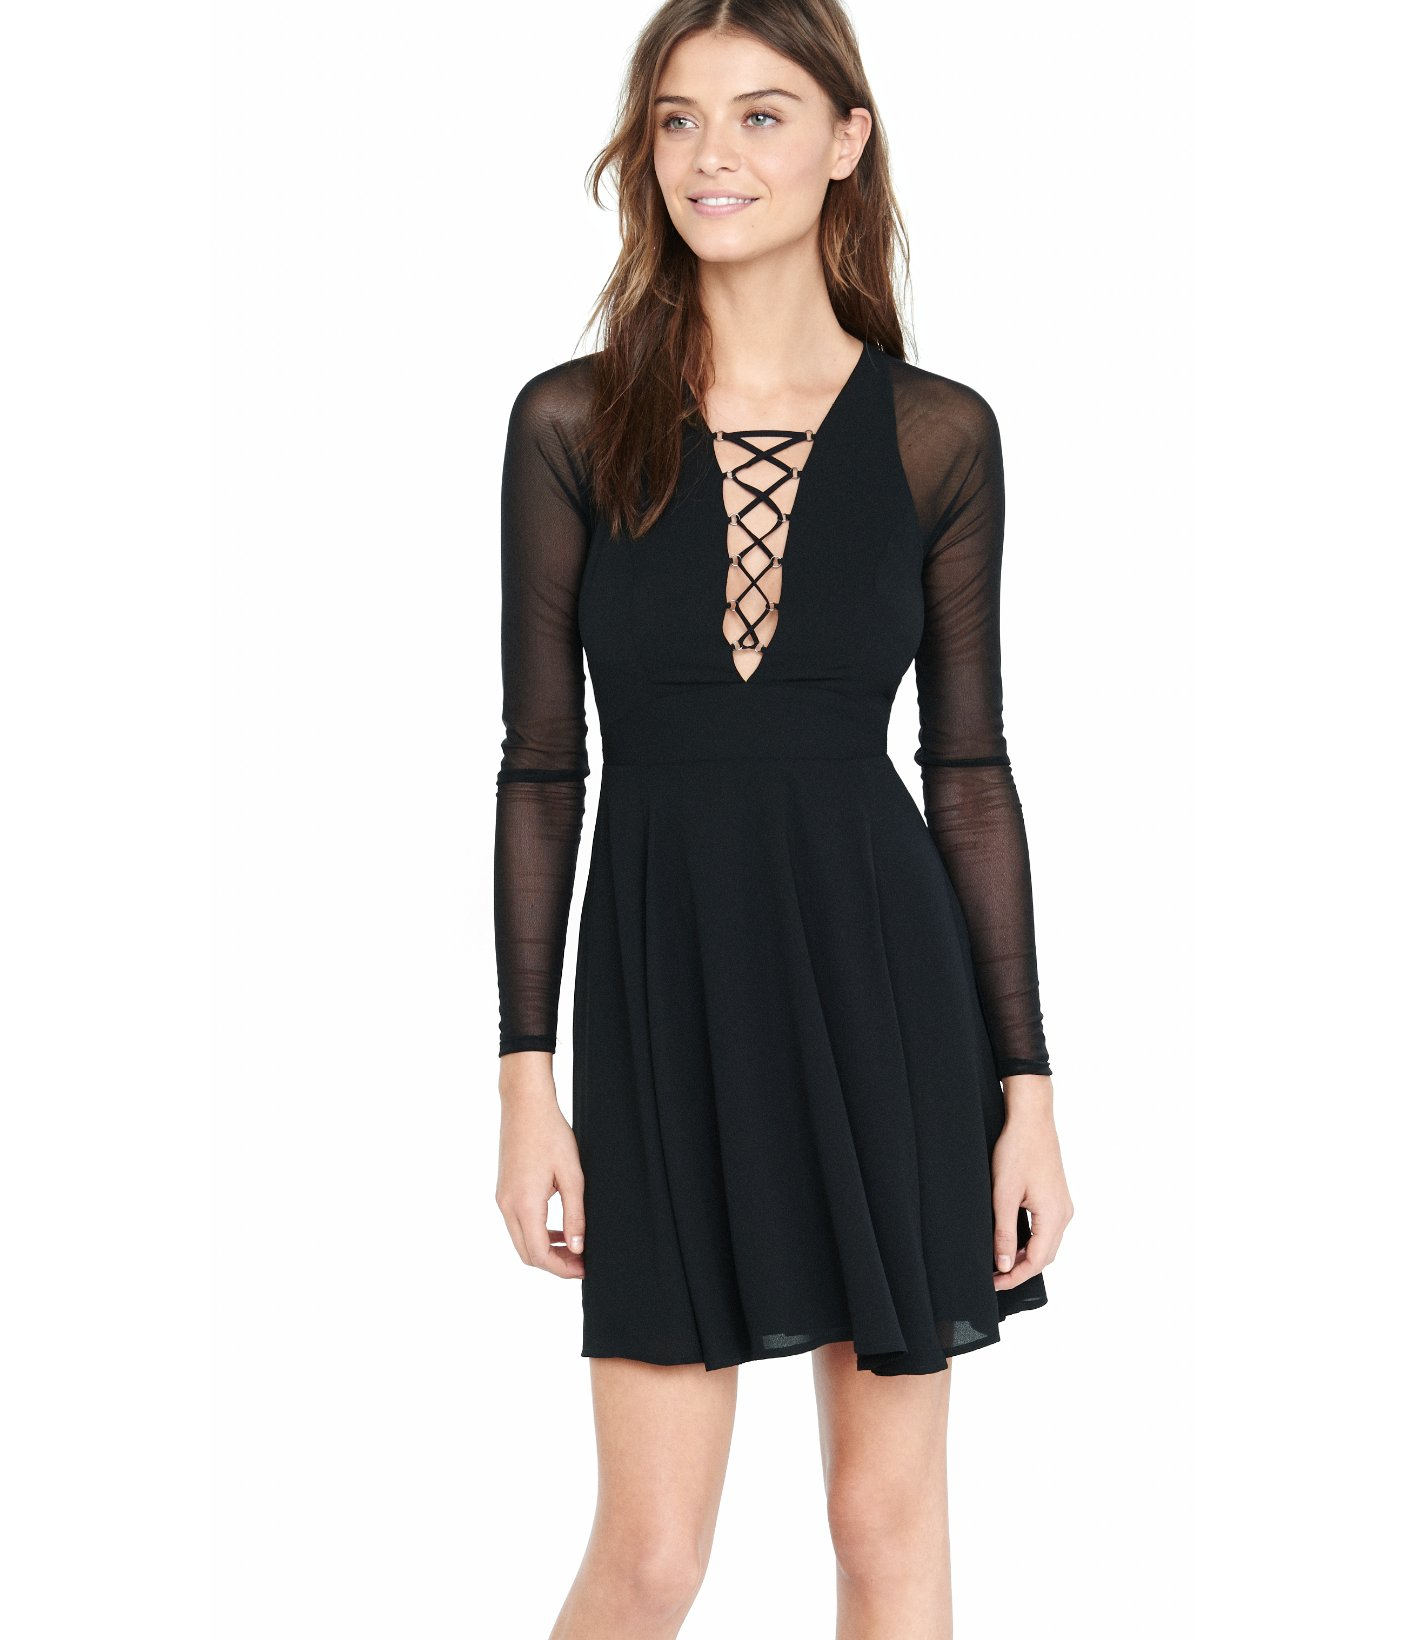 Black lace dress express